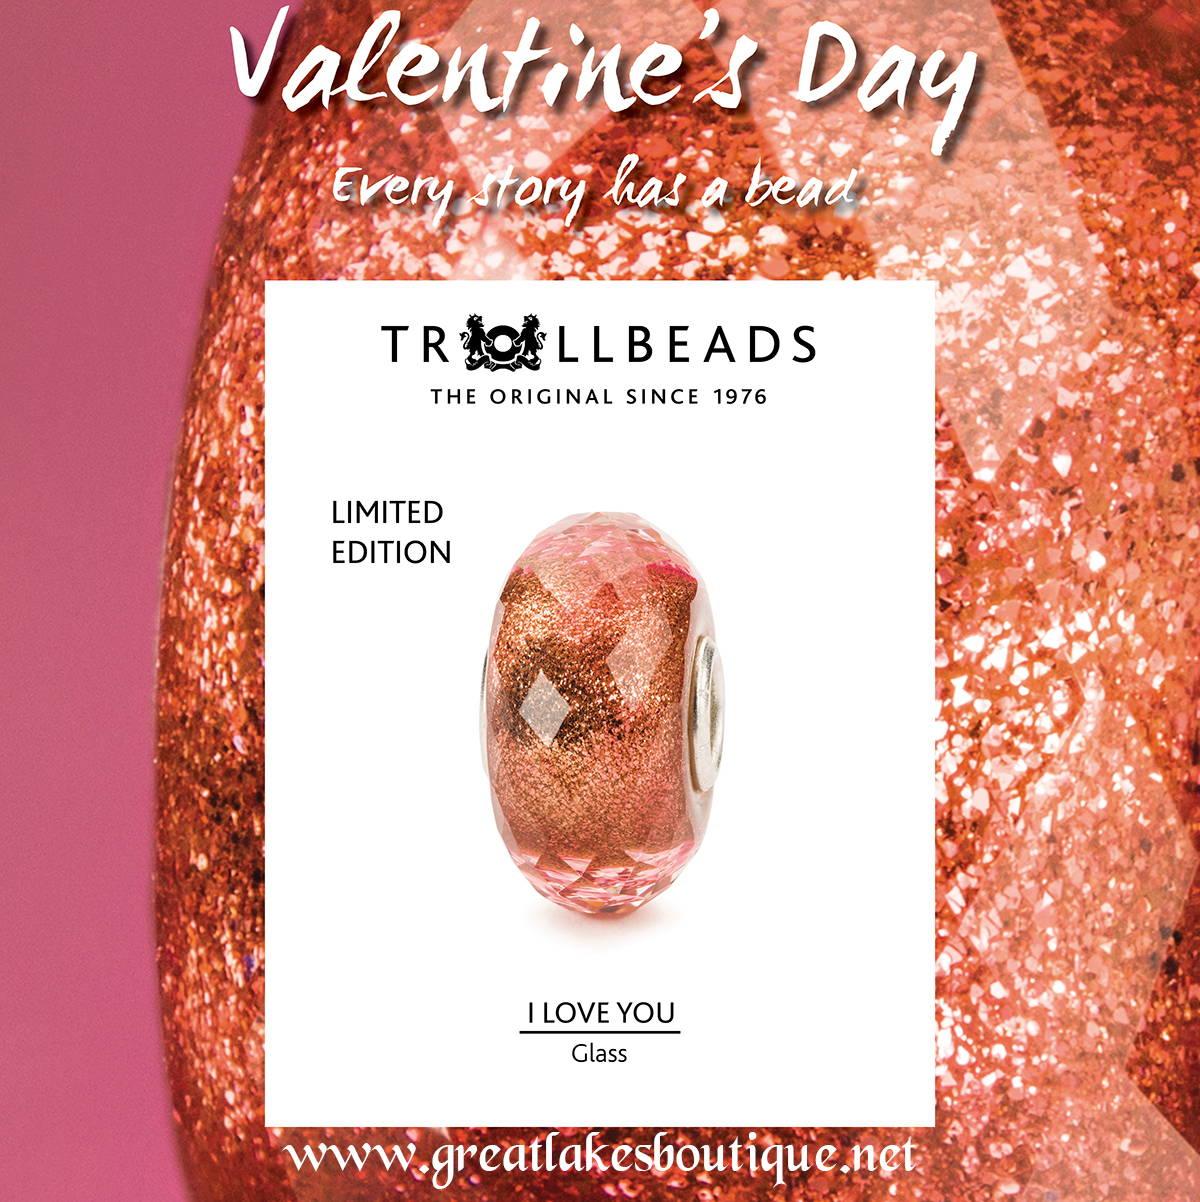 Trollbeads Valentine's Day 2021